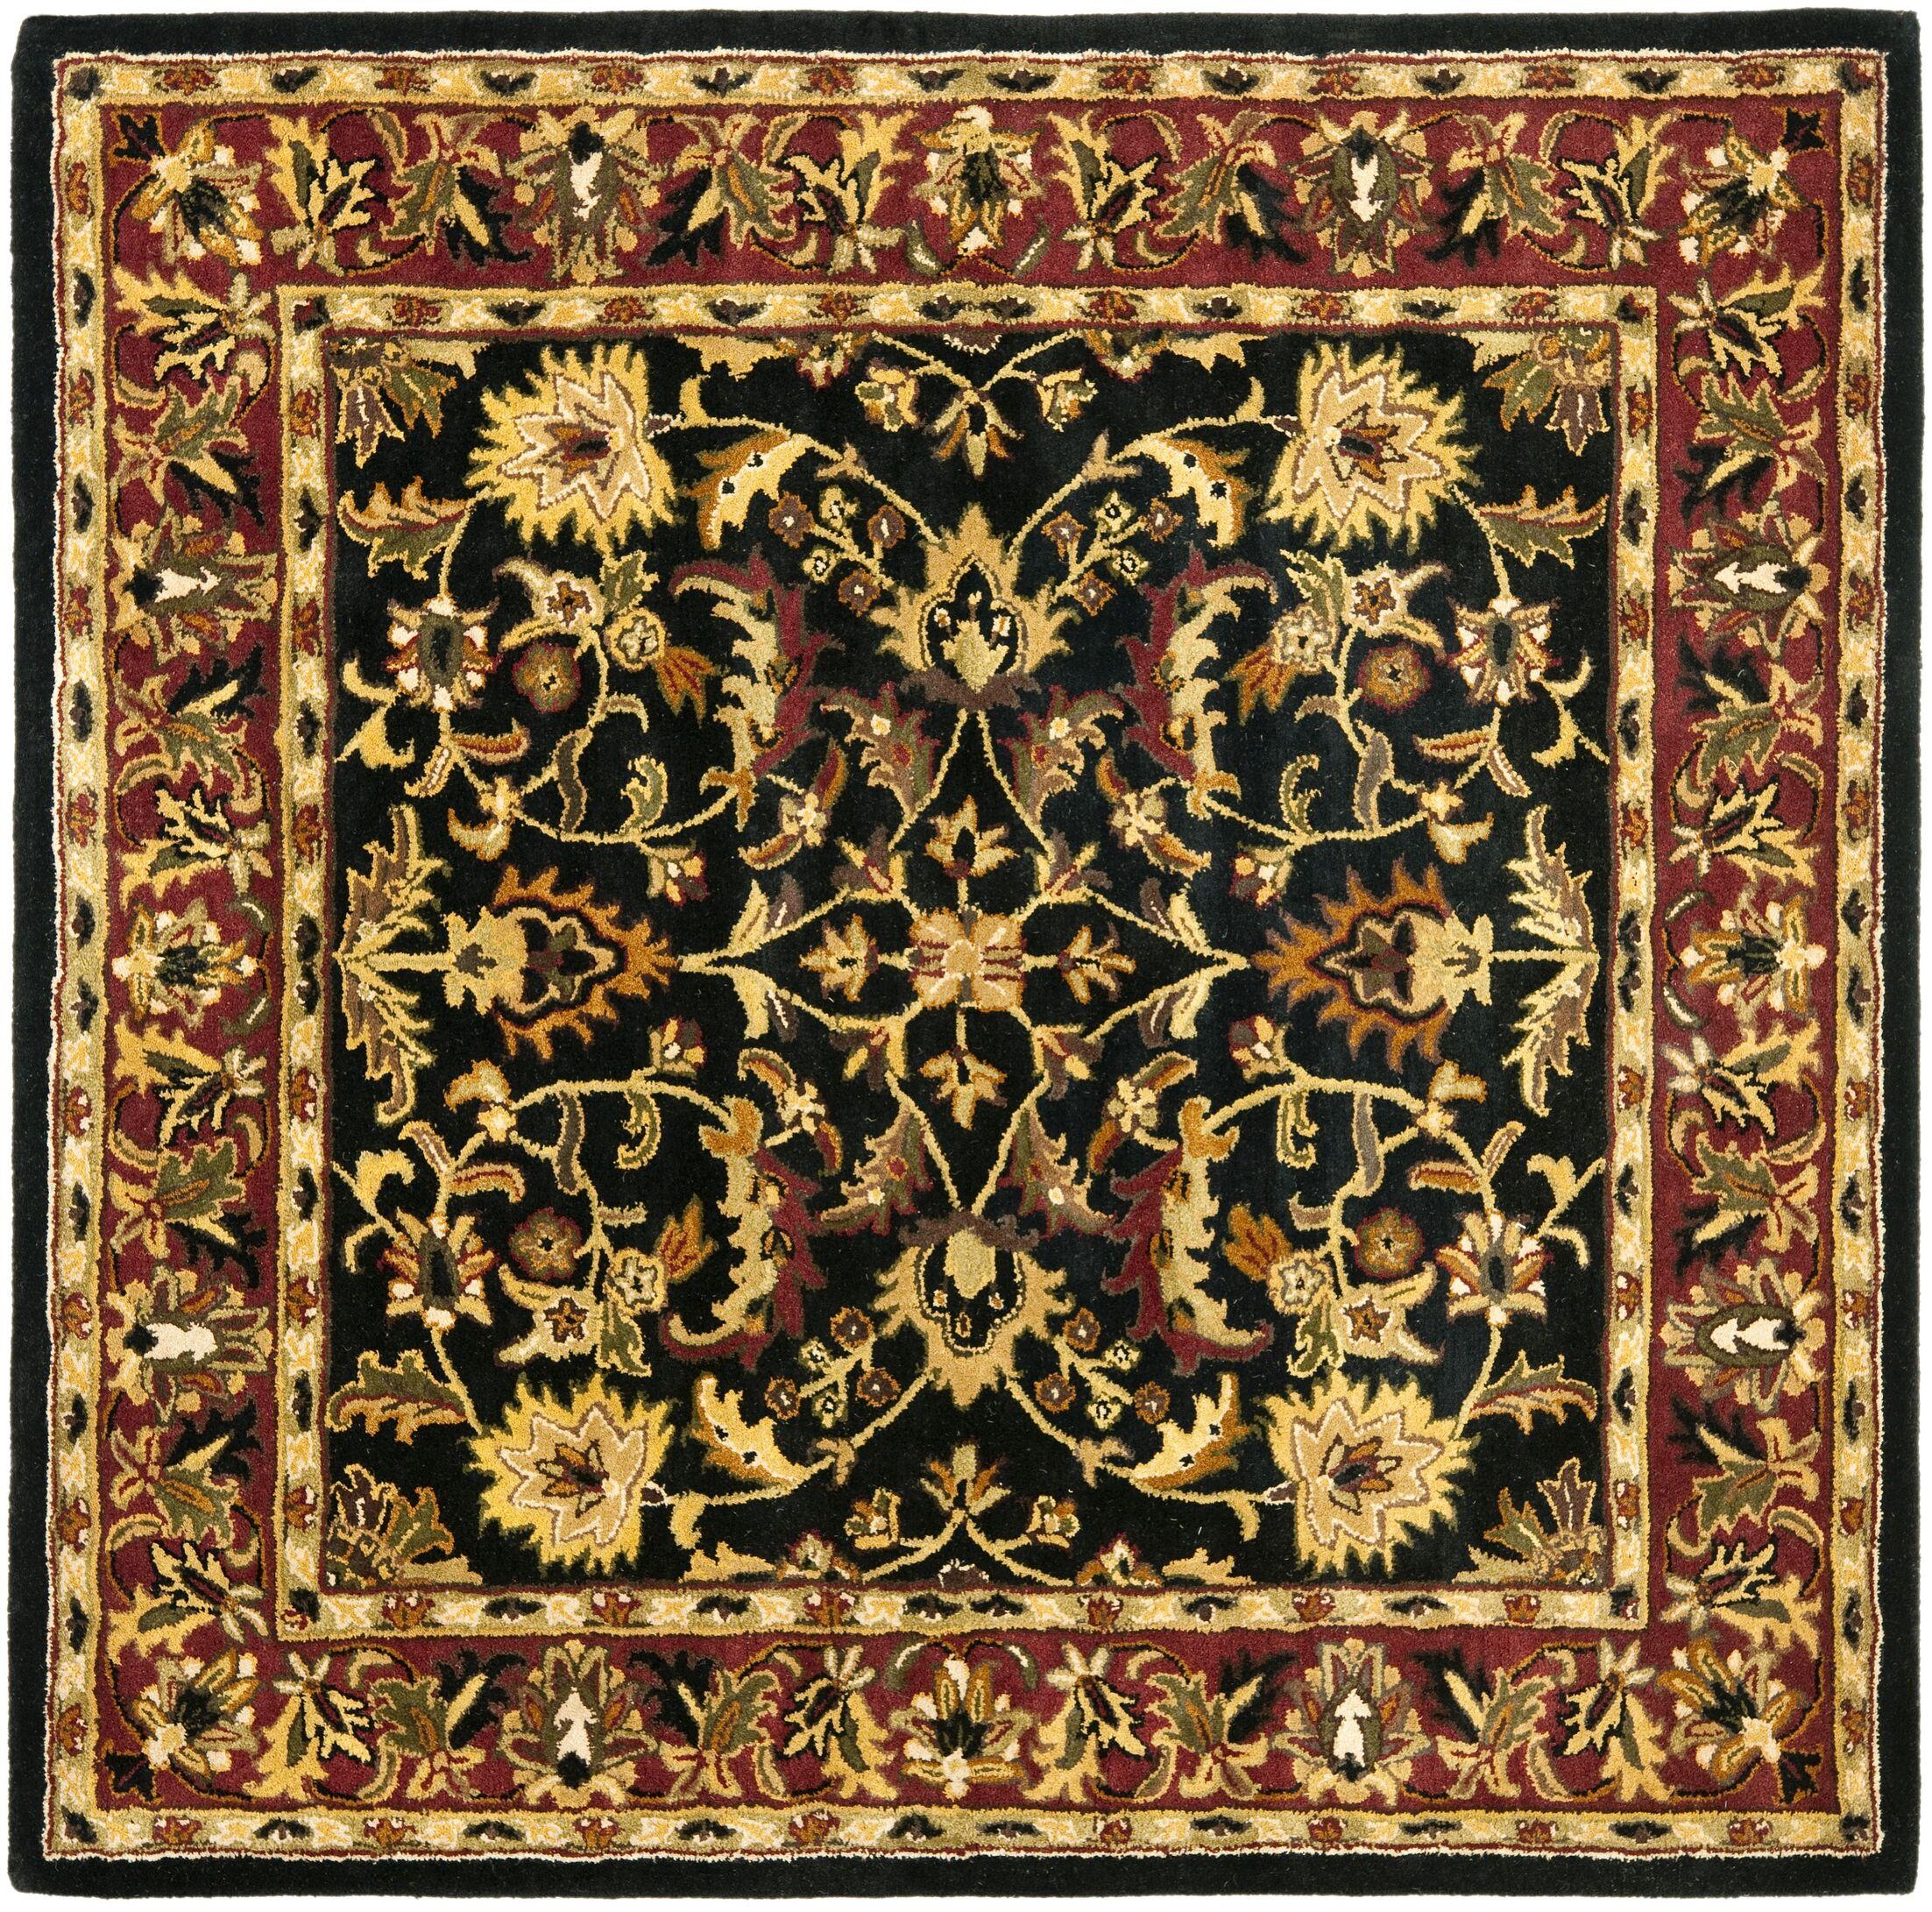 Cranmore Black Area Rug Rug Size: Square 10'